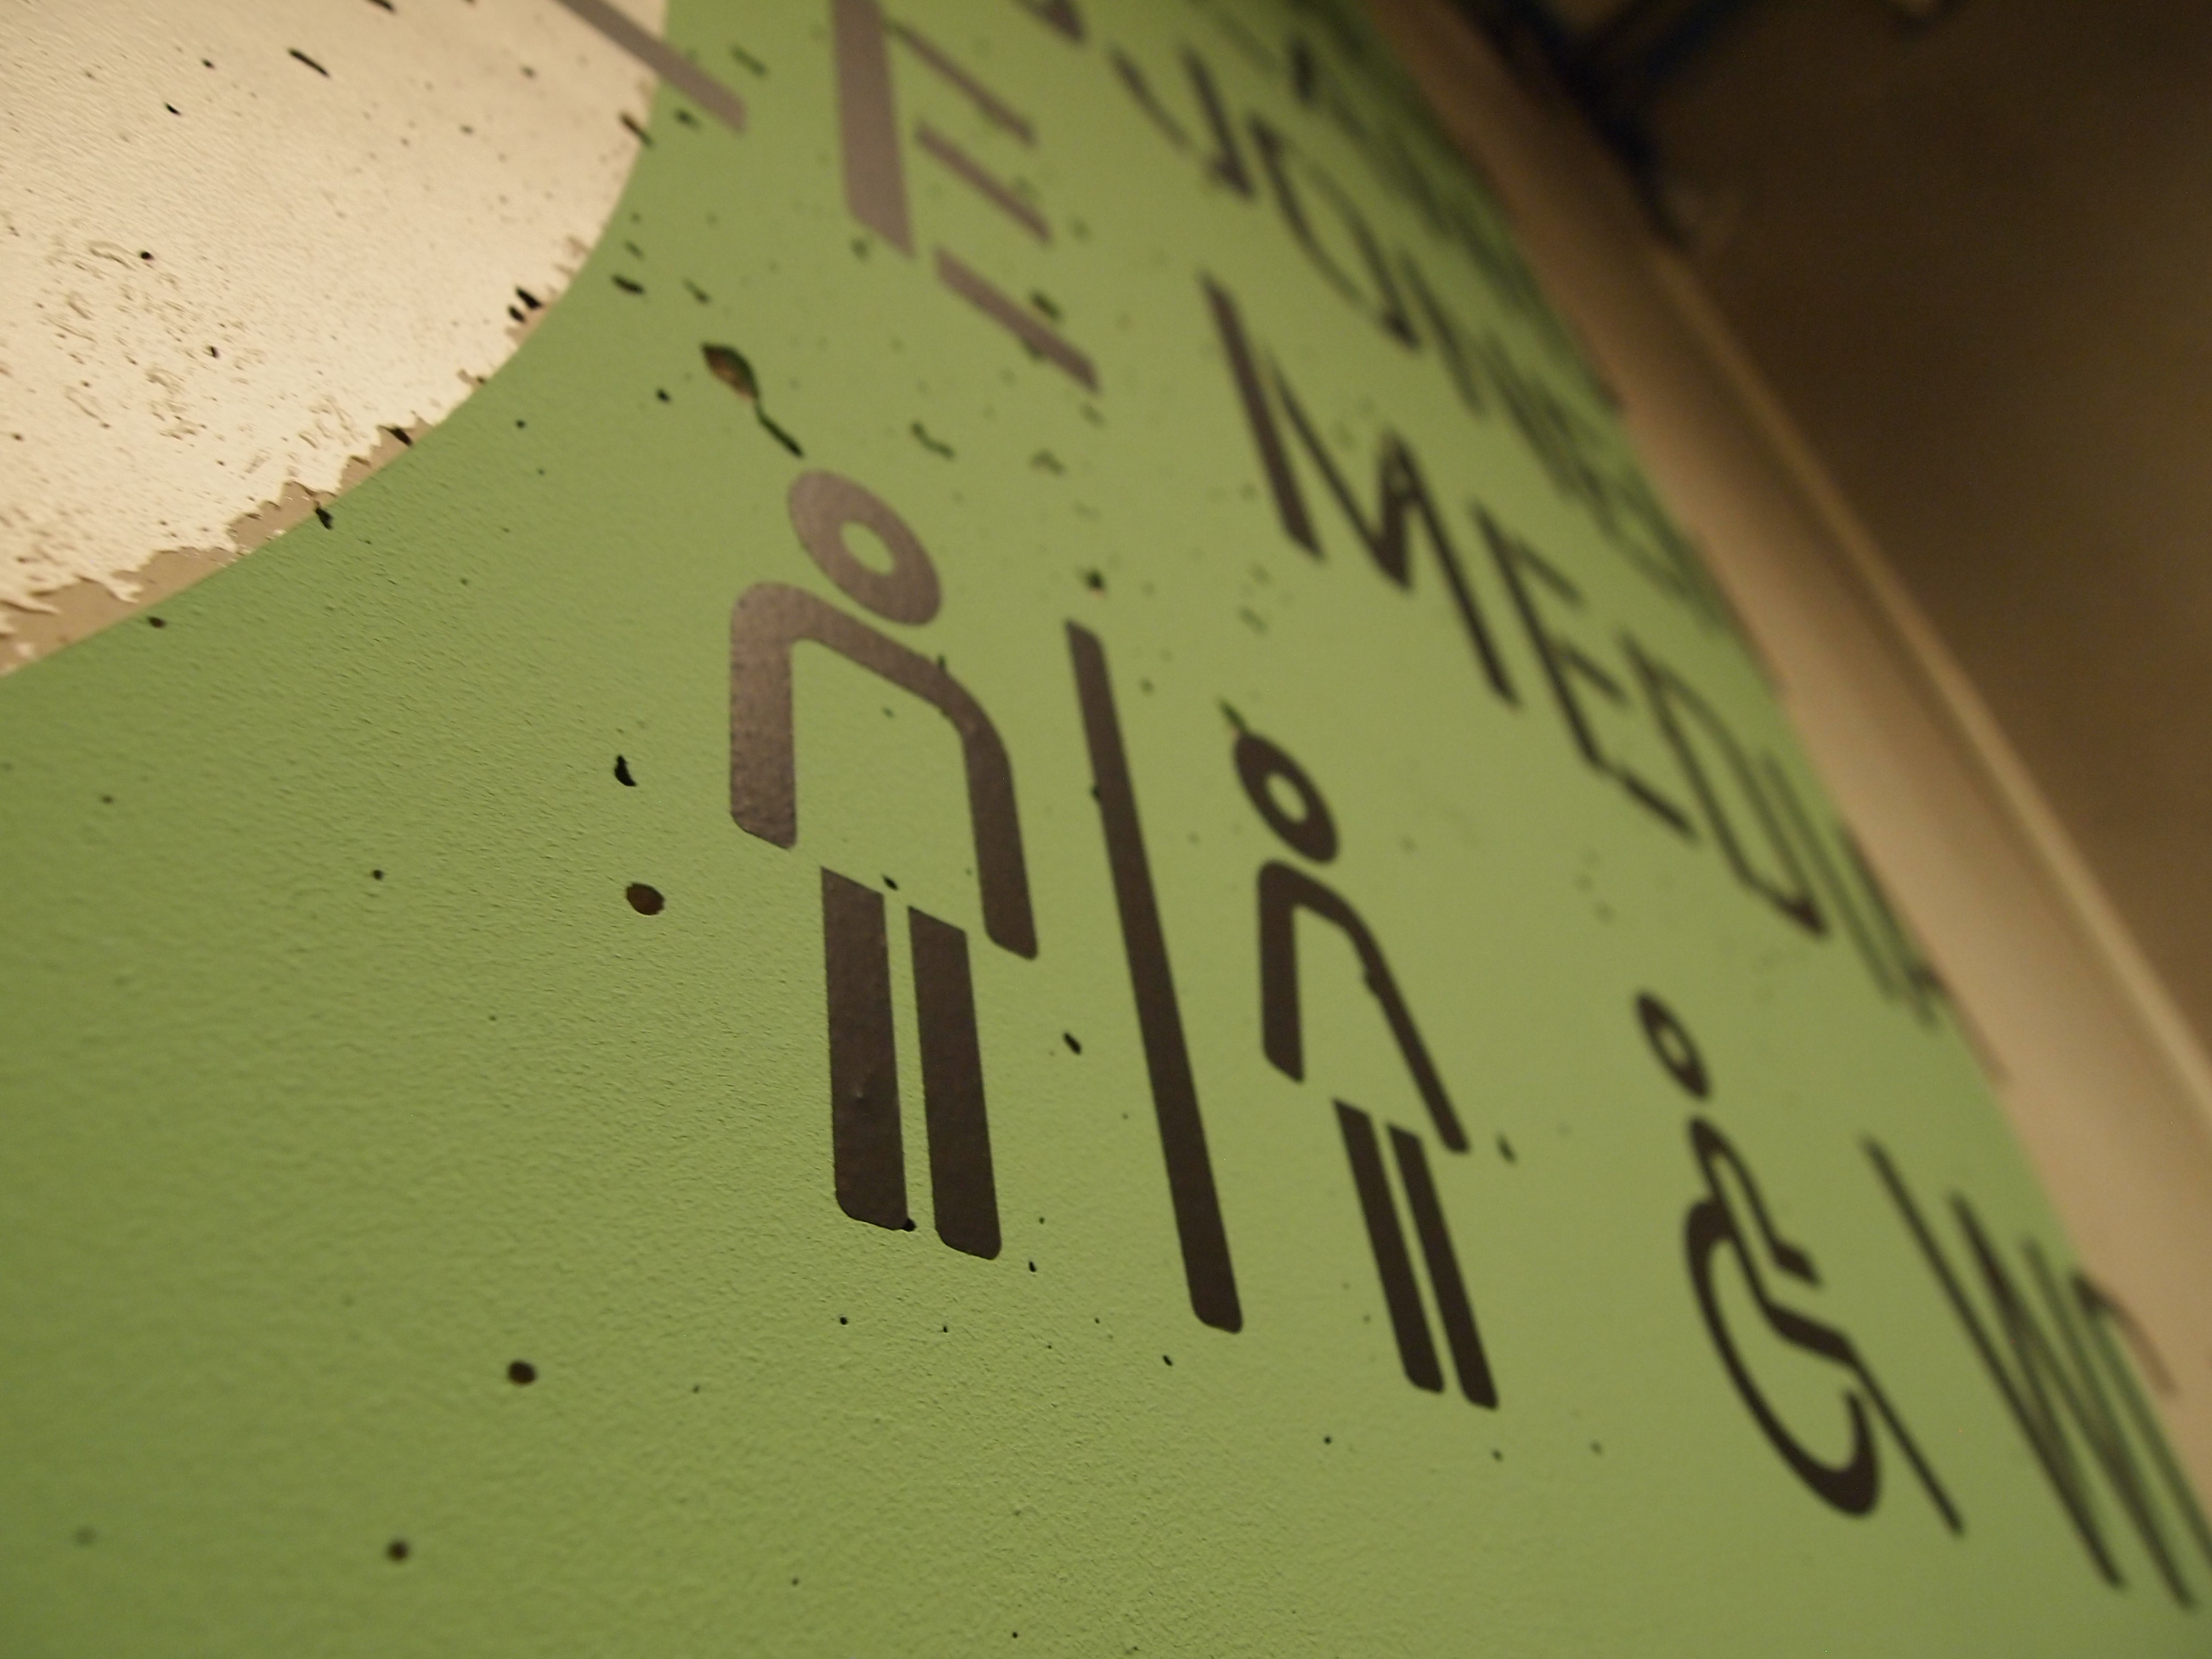 Foliedekor til Litteraturhuset i Fredrikstad banner Banner P1144598